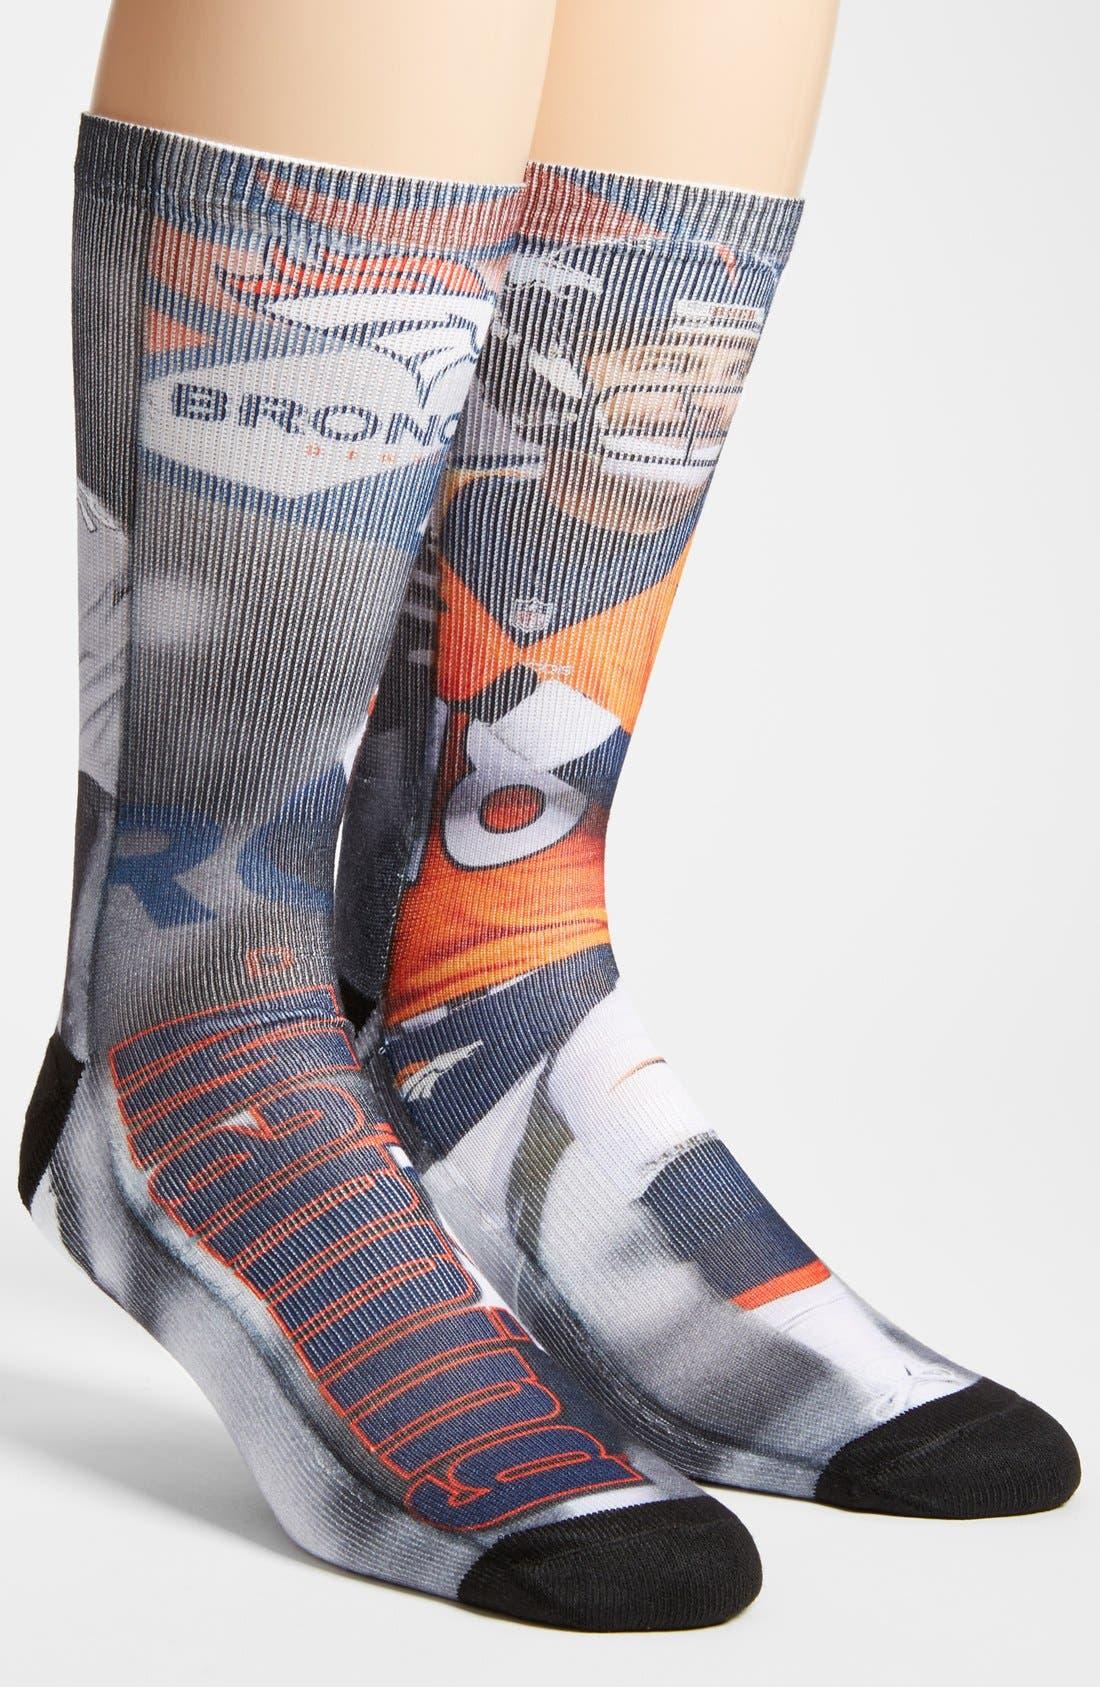 'Denver Broncos - Peyton Manning' Socks,                             Alternate thumbnail 4, color,                             001